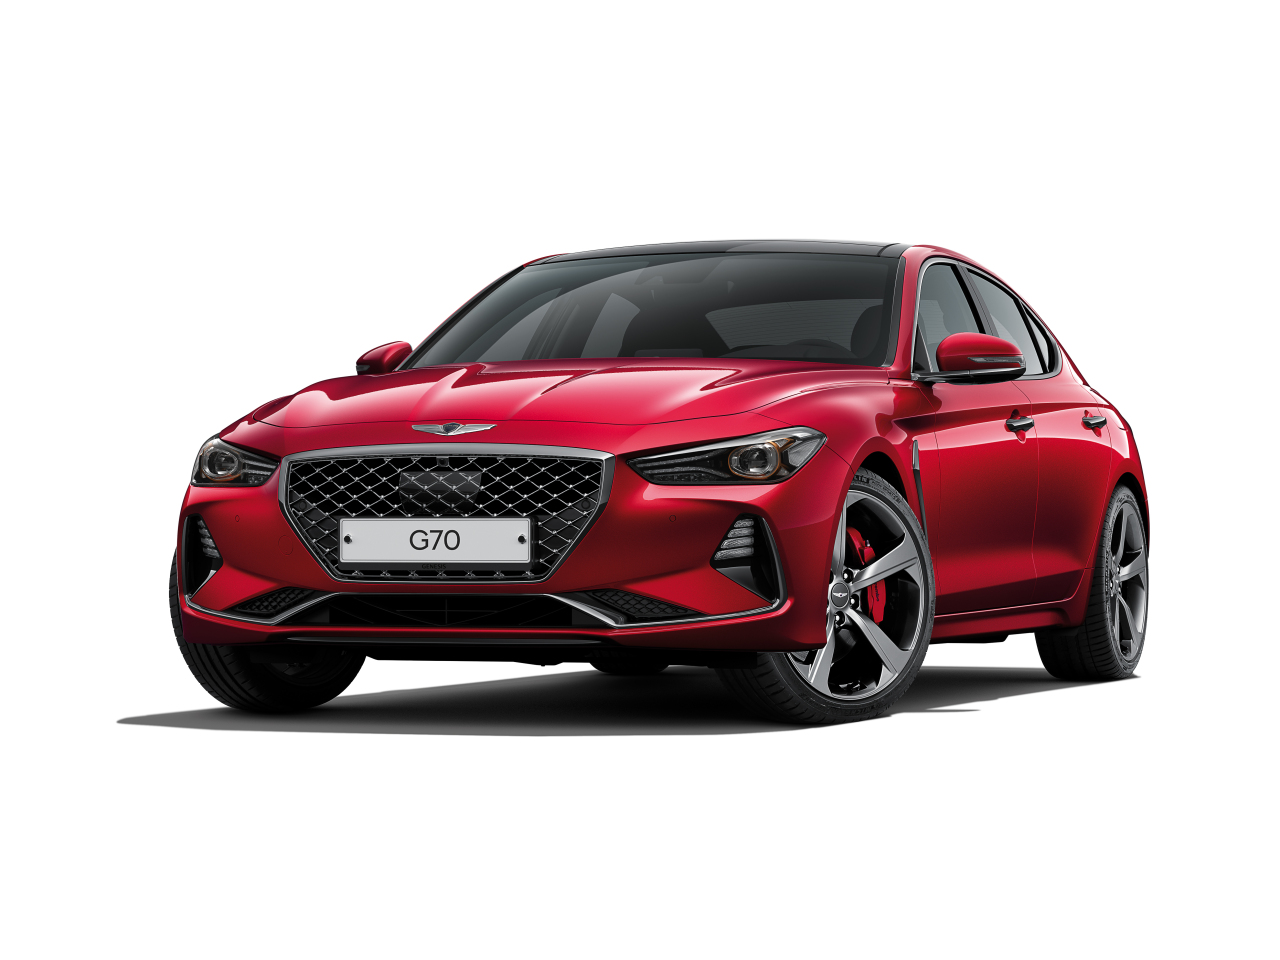 G70 (Hyundai Motor Group)